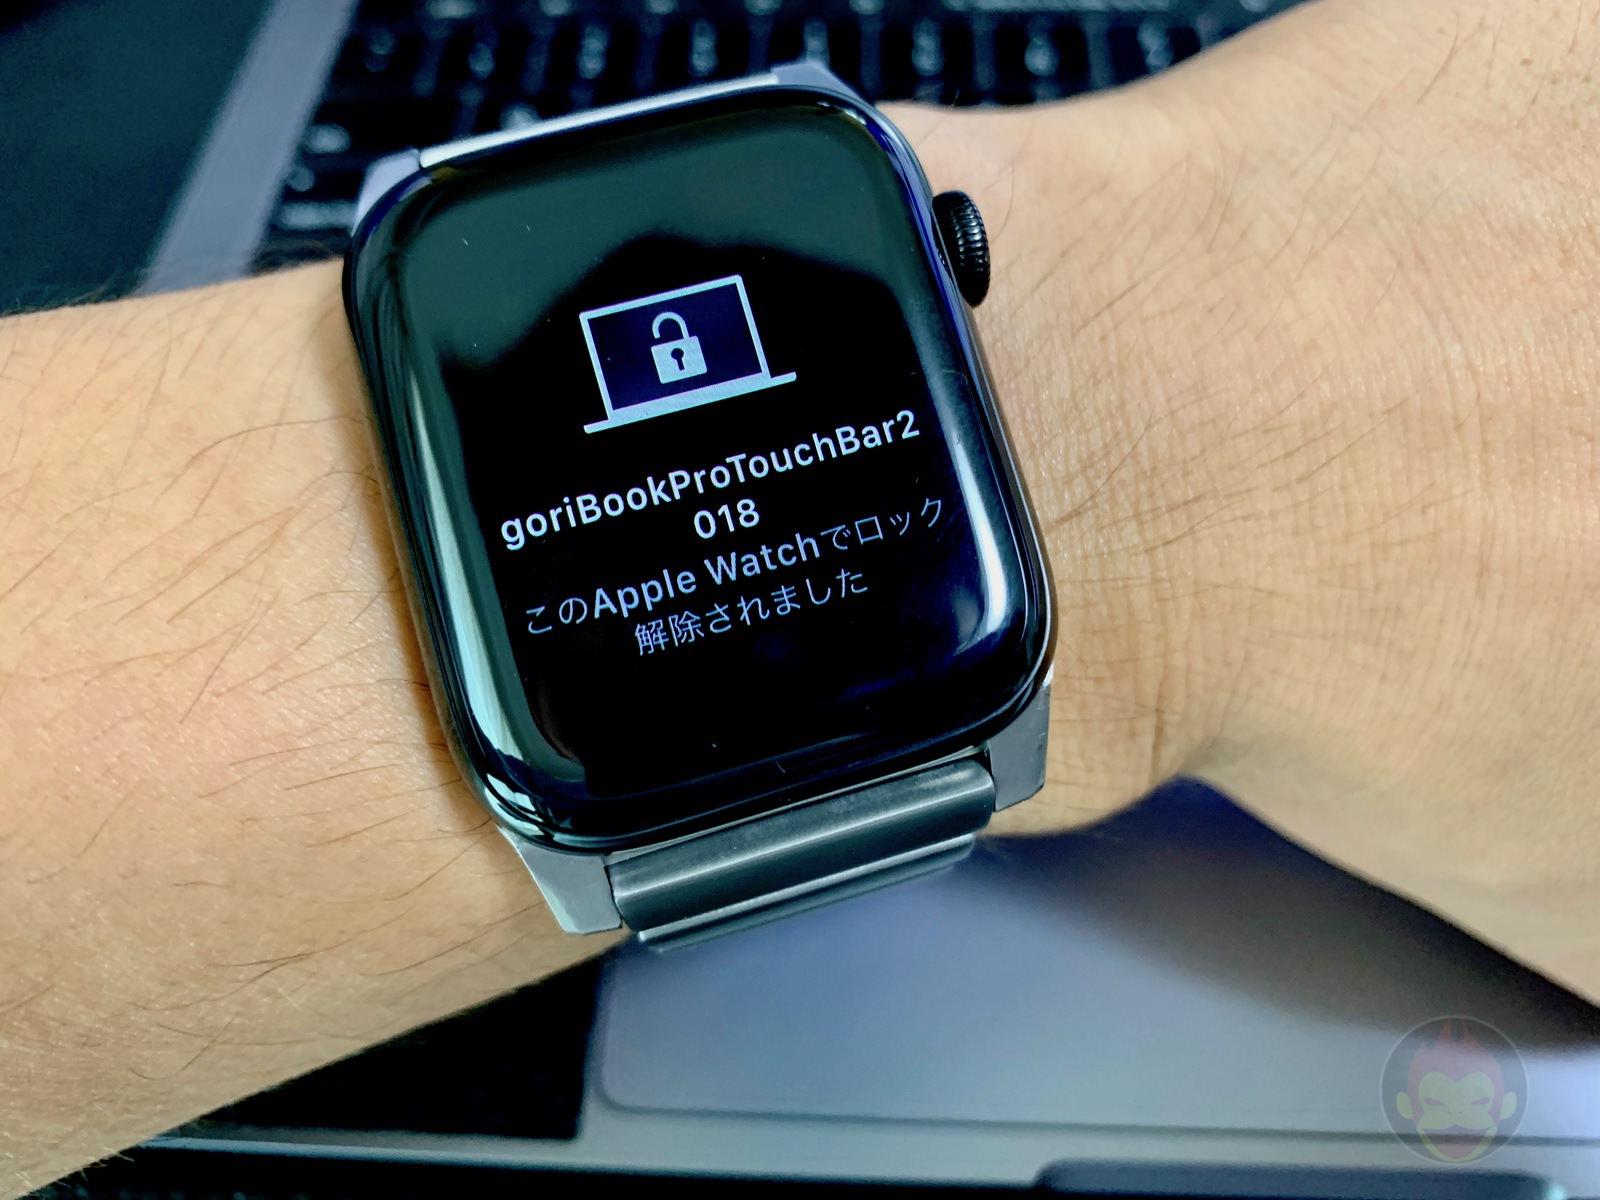 Unlock-mac-with-Apple-Watch-01.jpg